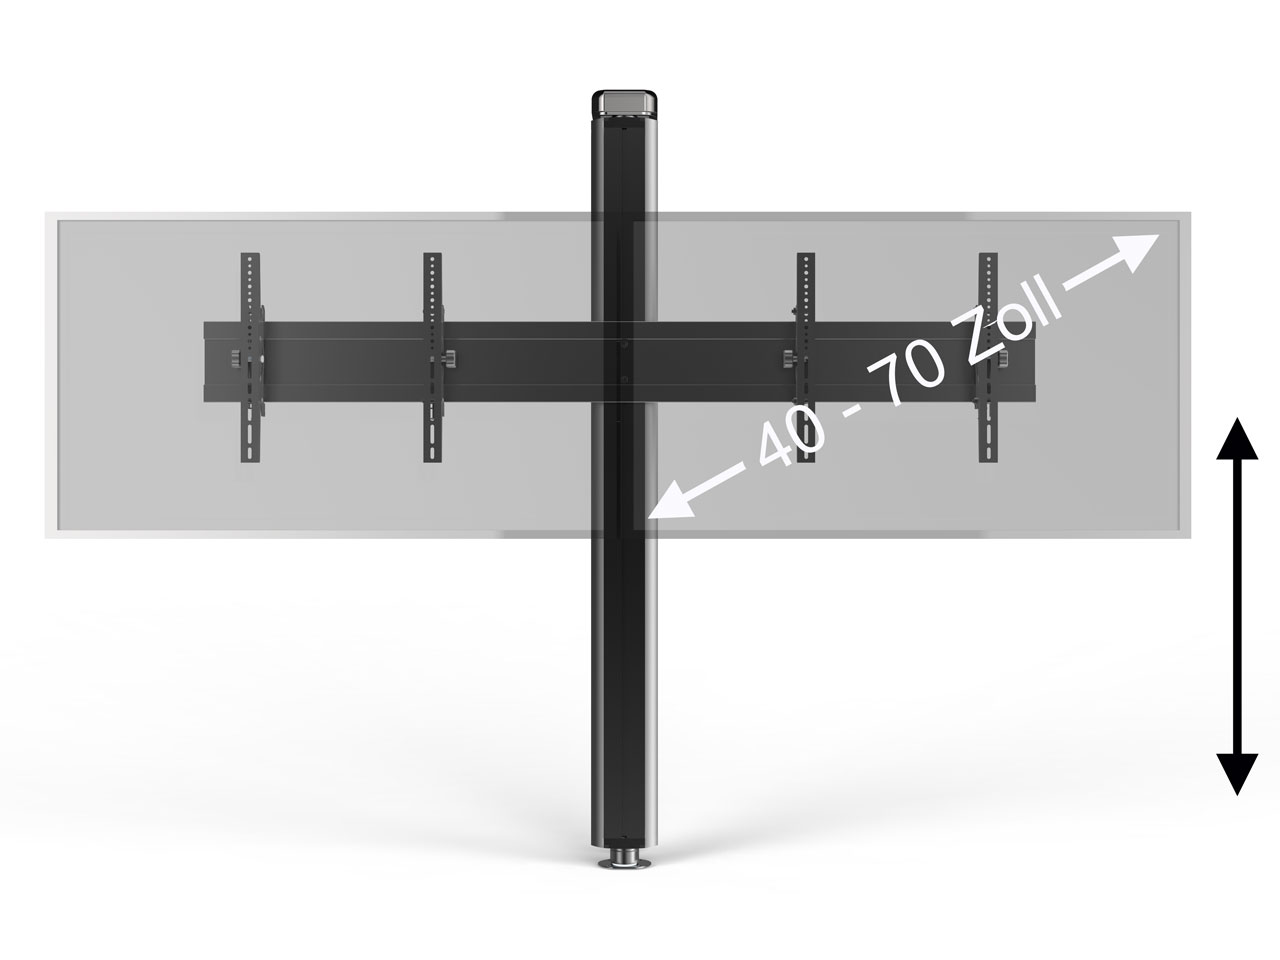 wand boden tv s ulenhalter schwarz f r 2 bildschirme 40 70. Black Bedroom Furniture Sets. Home Design Ideas